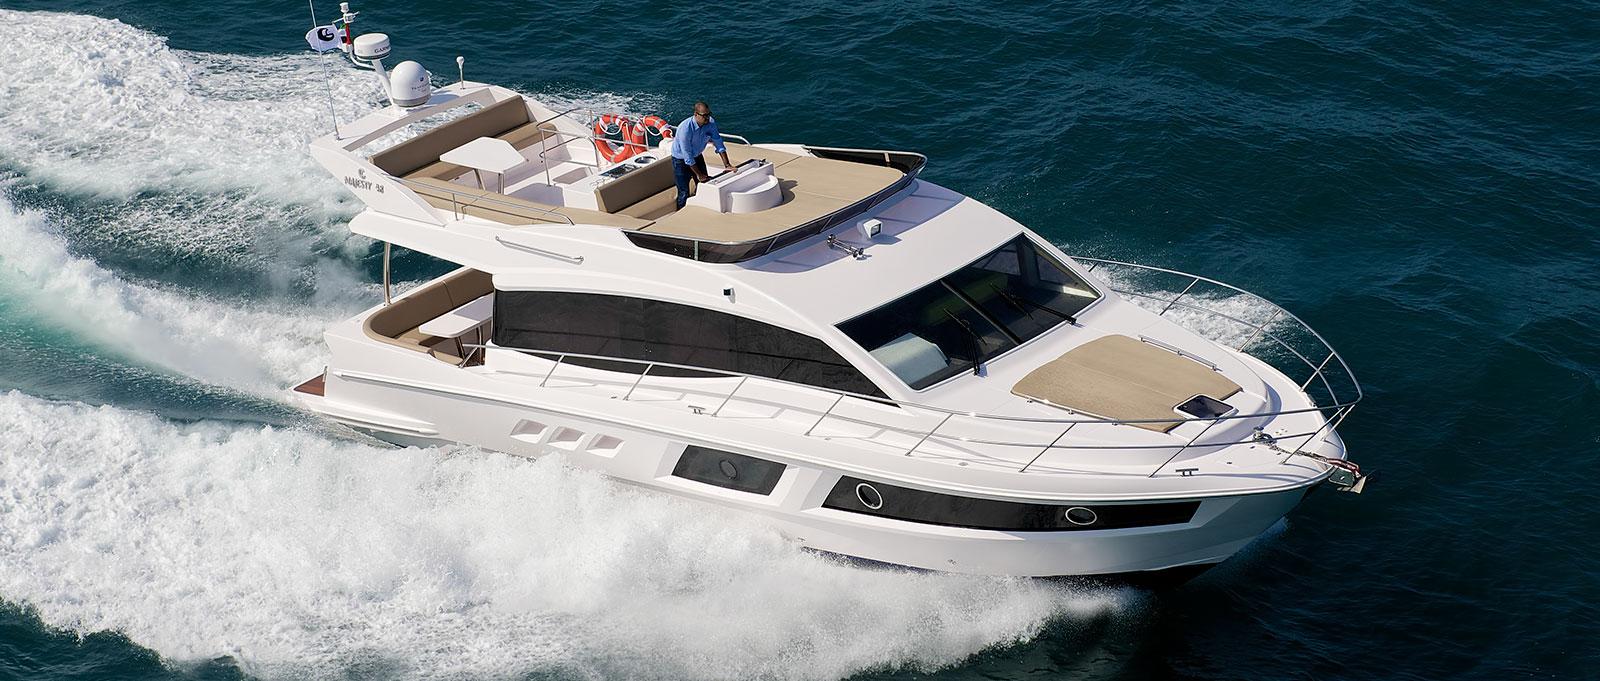 Majesty Yachts Luxury Superyachts Amp Yachts By Gulf Craft